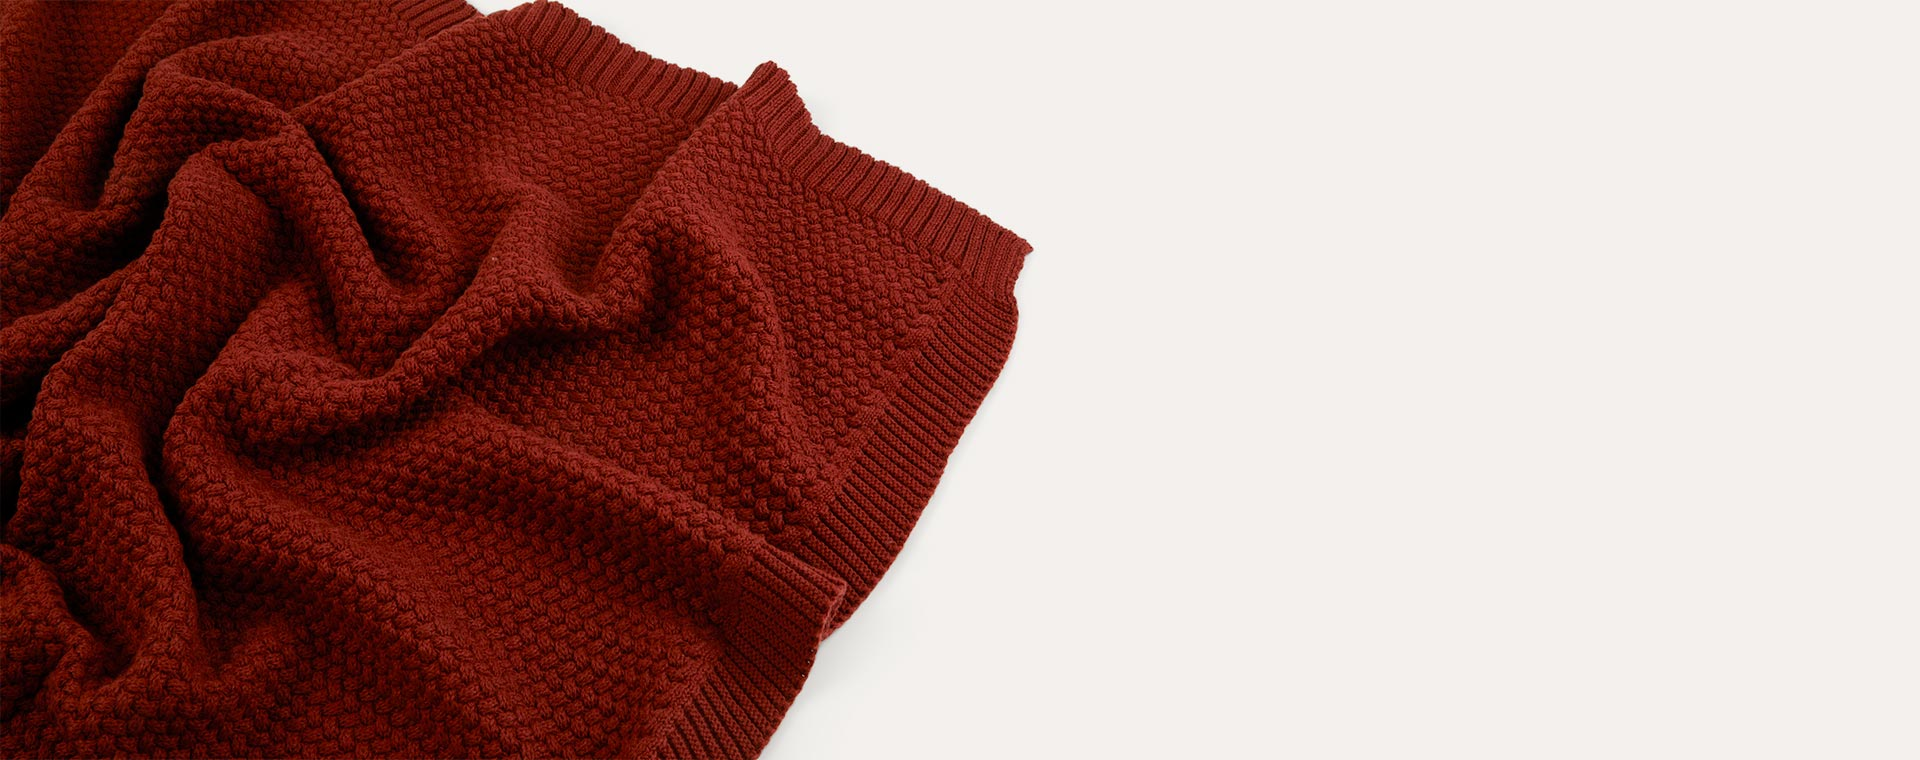 Burnt Sienna Avery Row Knitted Blanket